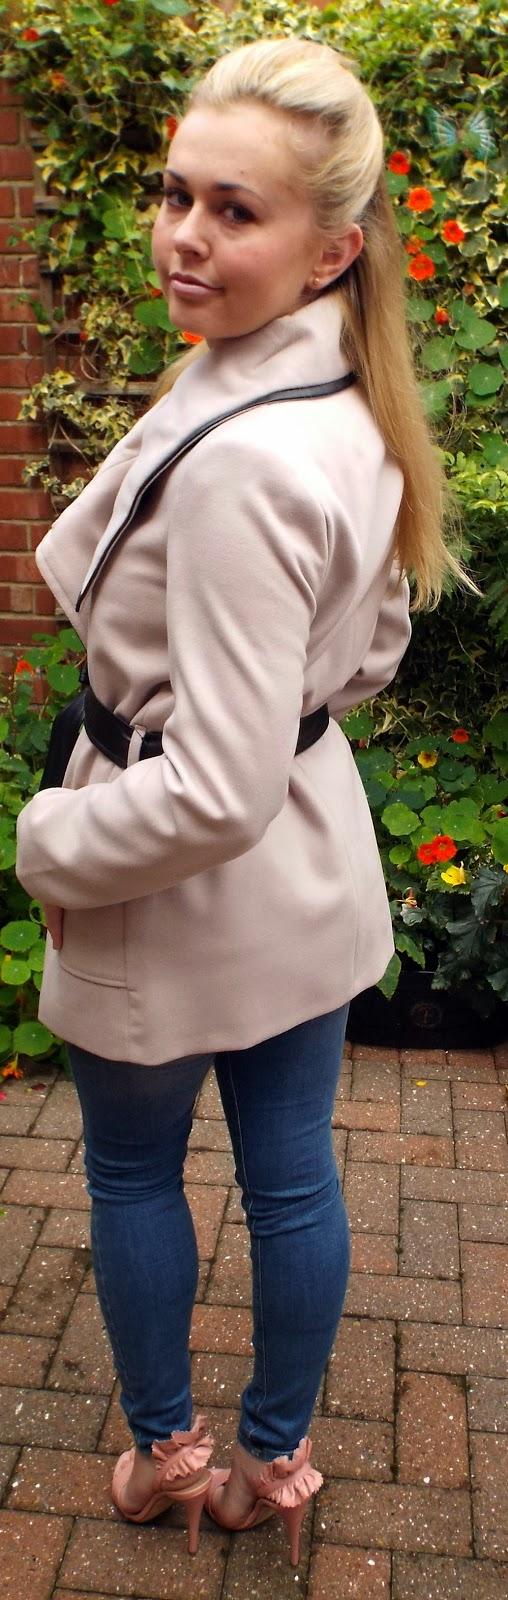 Primark Pink Jacket